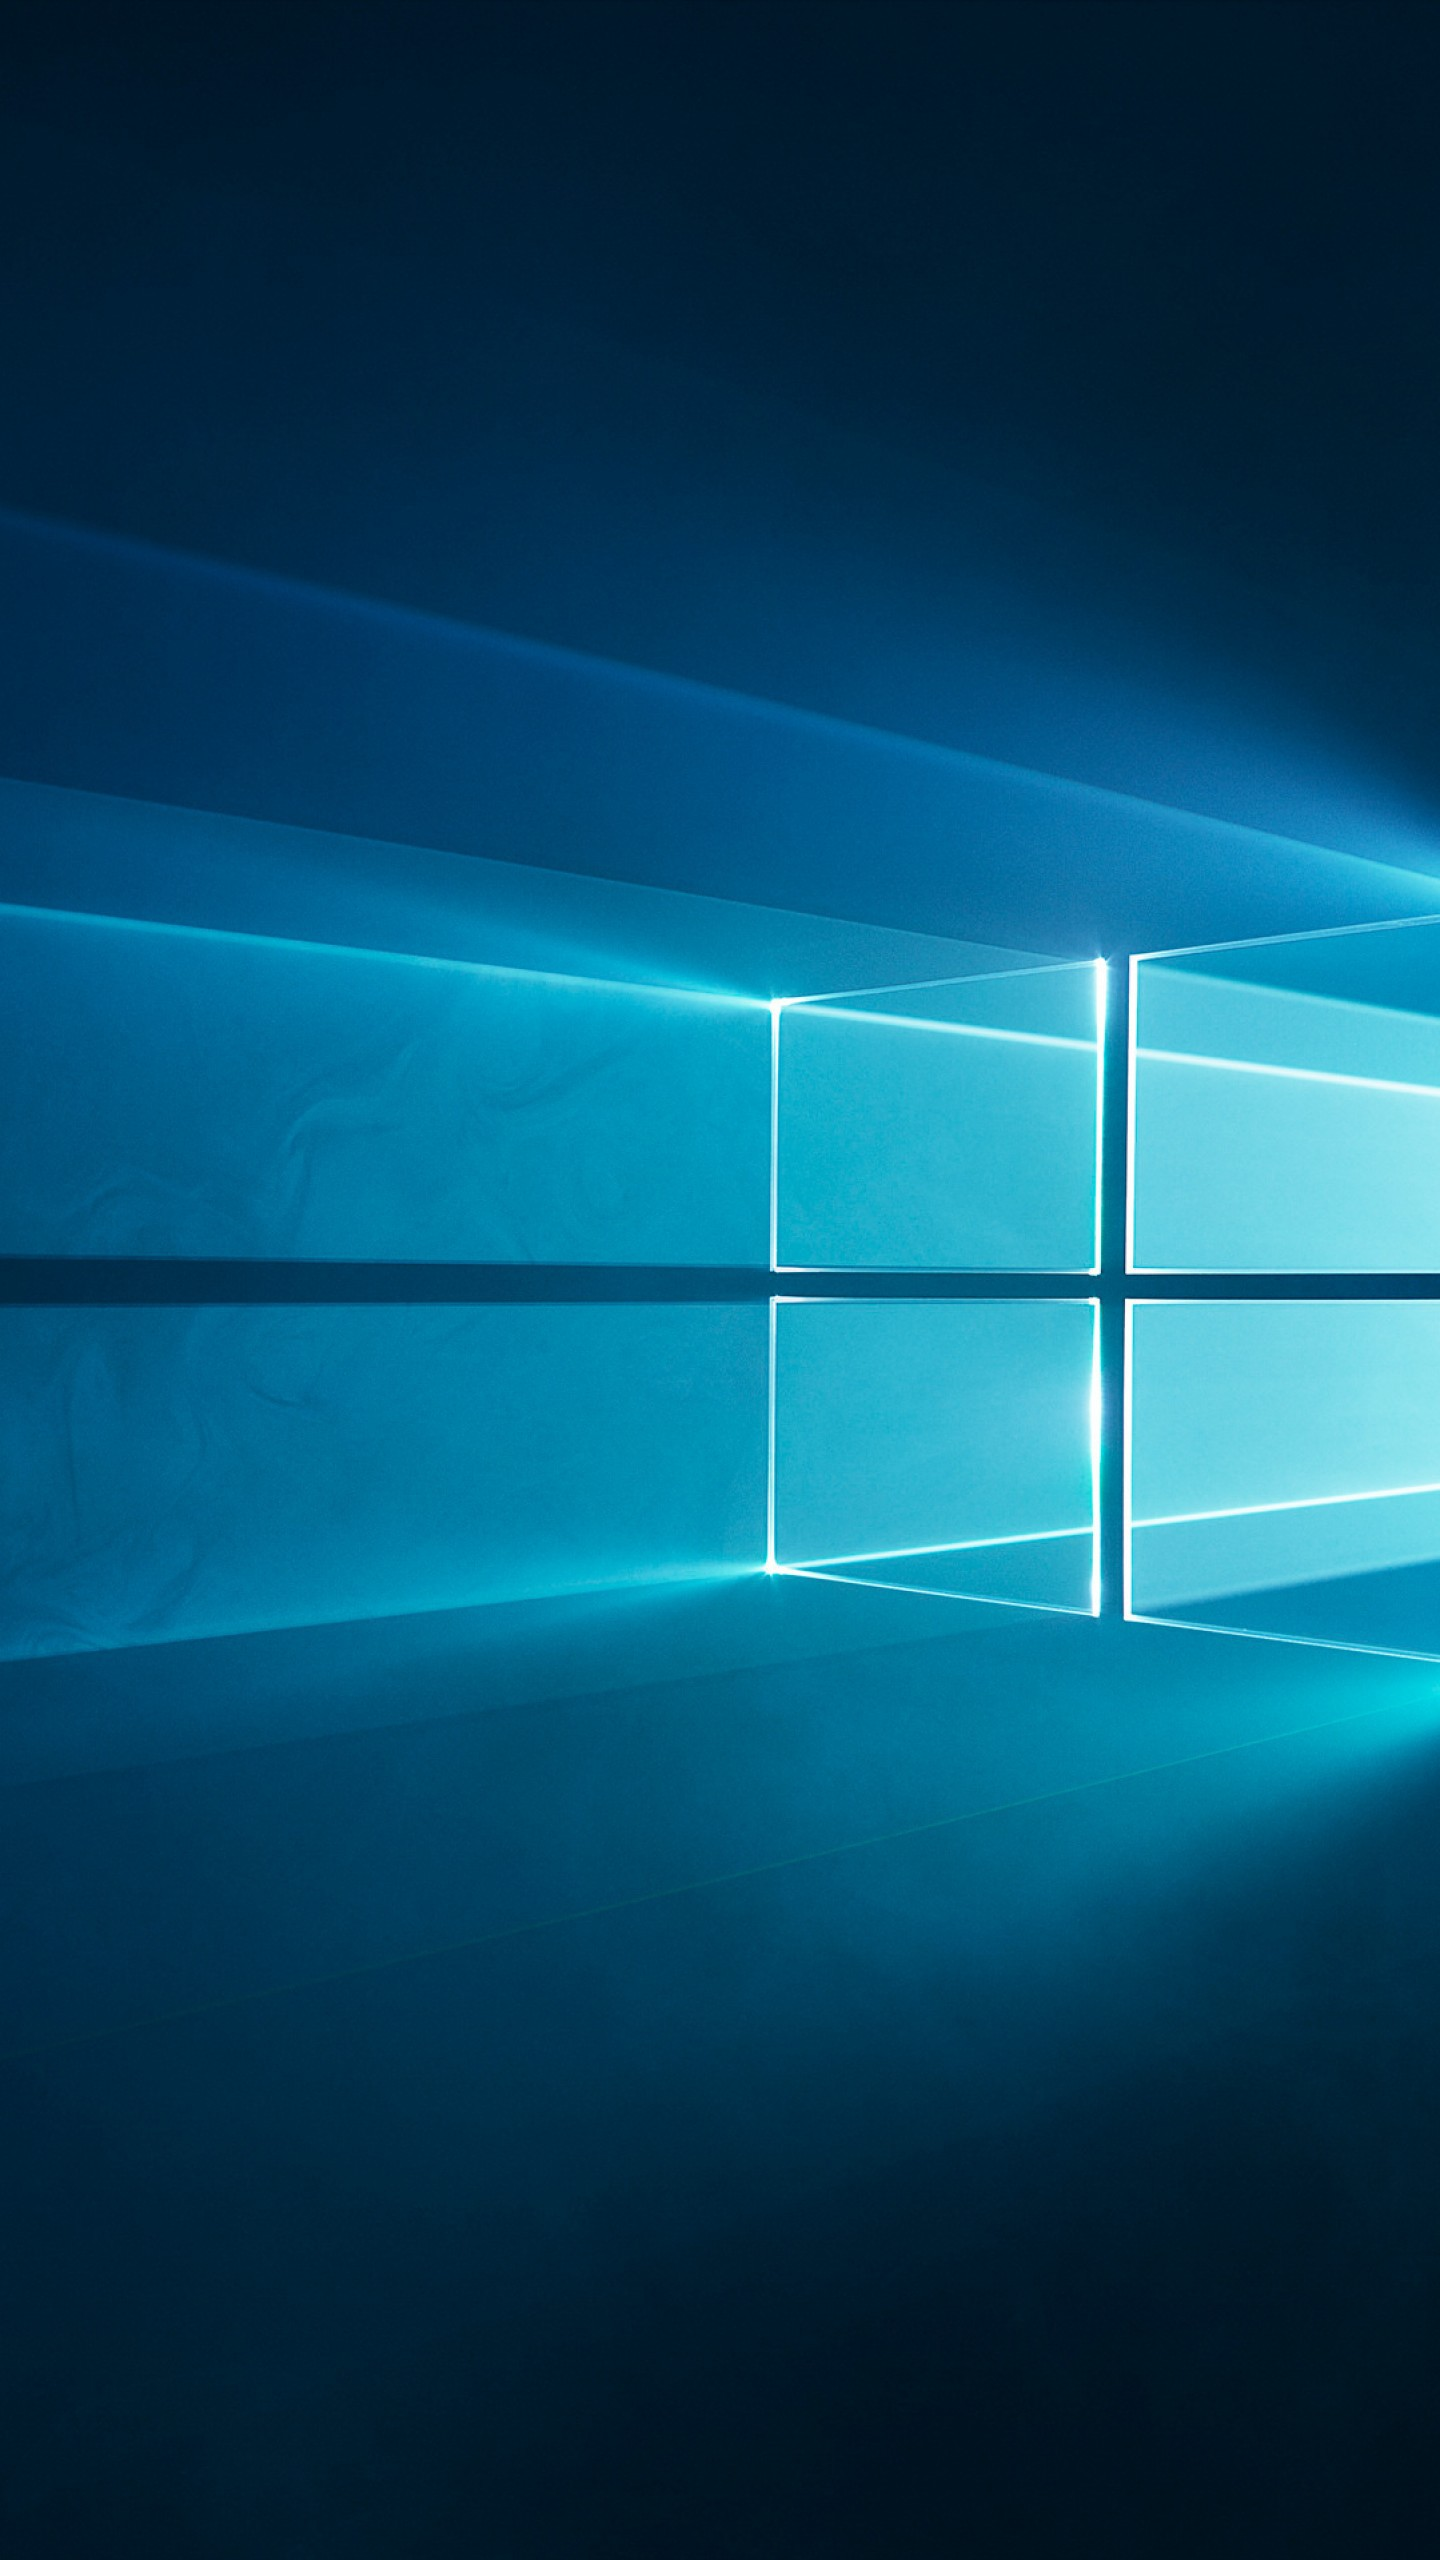 عکس زمینه آرم ویندوز 10 آبی رنگ پس زمینه